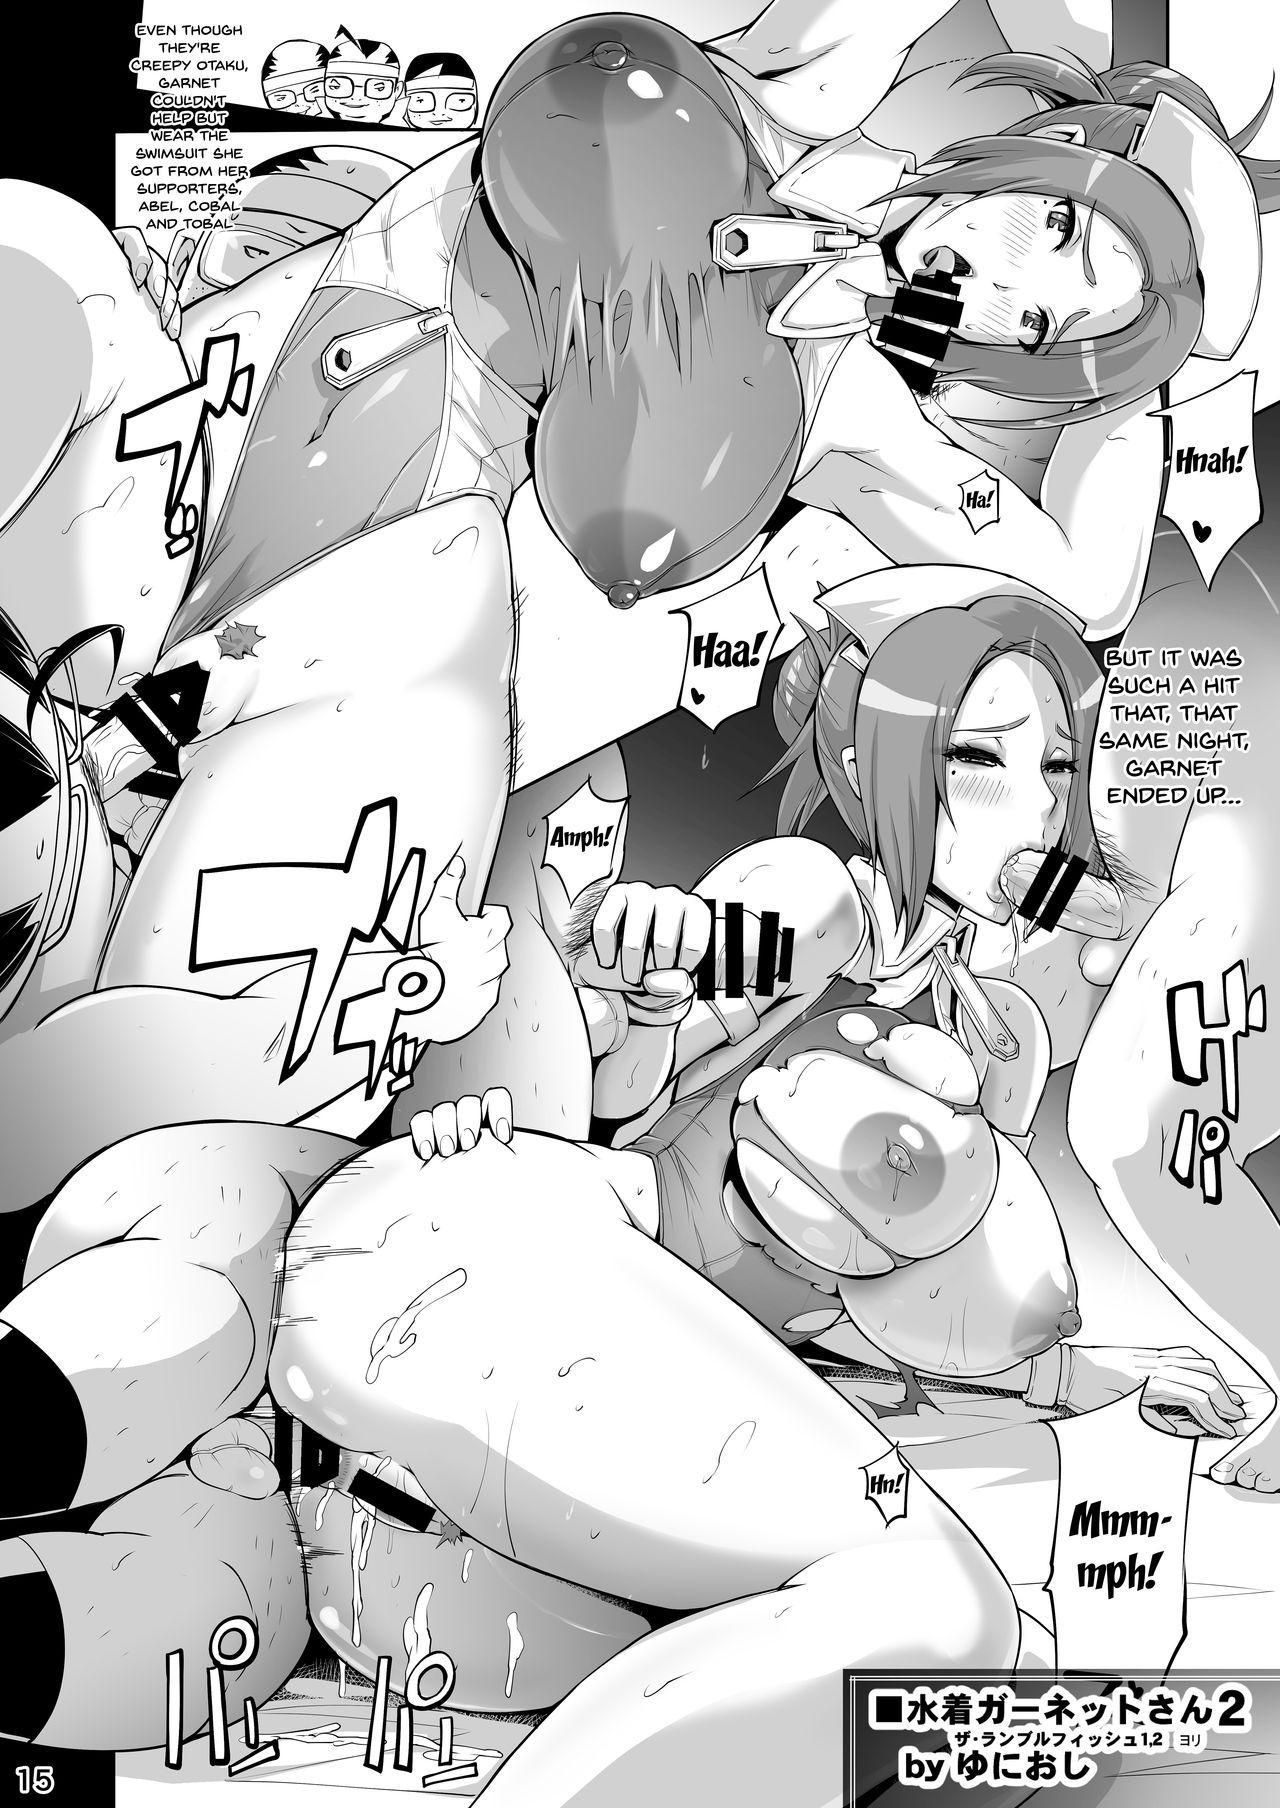 [POWERPLAY (Various)] CAPCOM (& MORE!) VS FIGHTING GIRLS Swimsuit & Gangbang Special (Various) [English] {Doujins.com} [Digital] 11